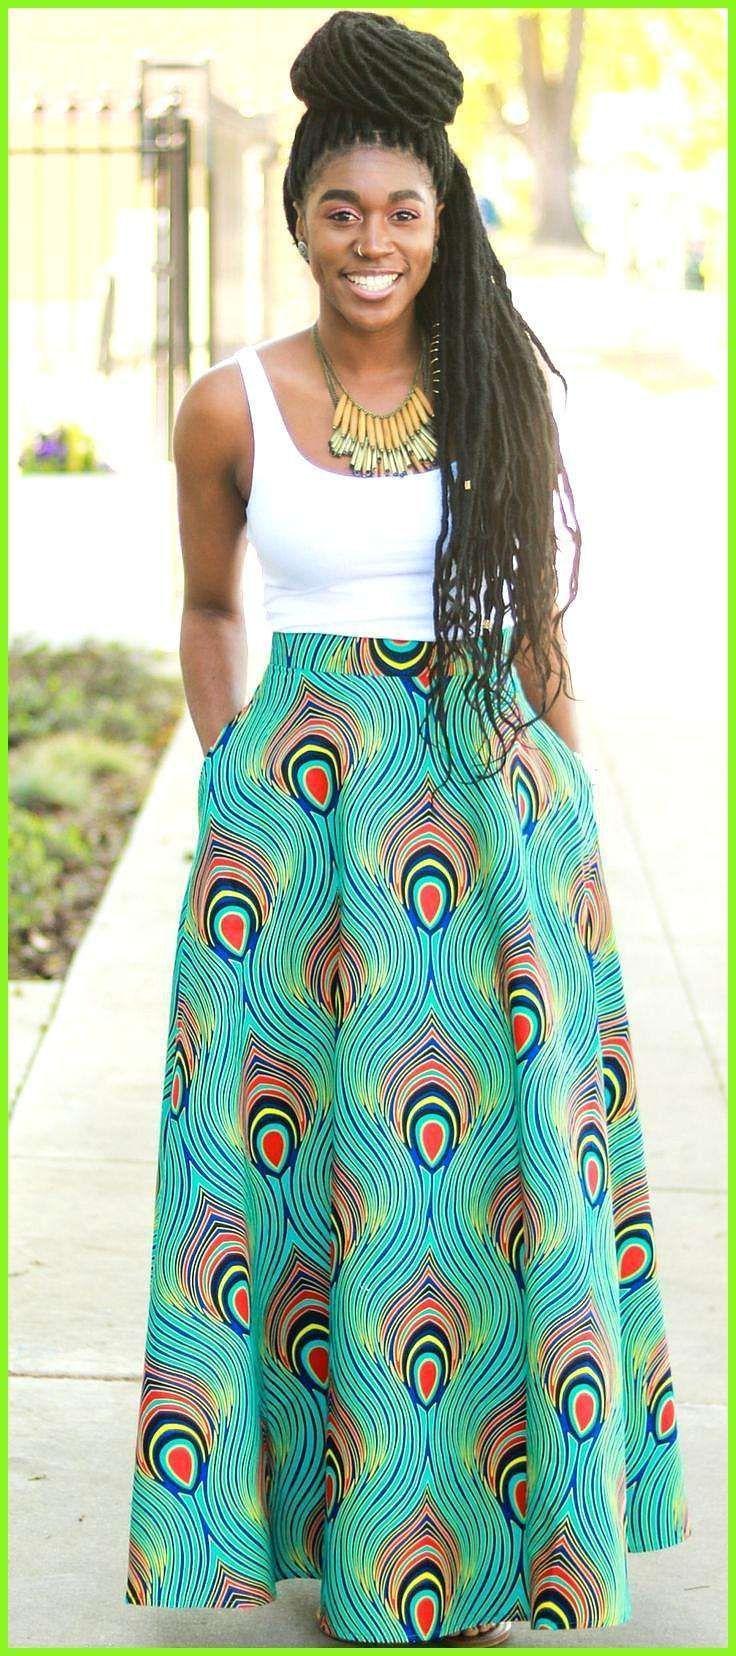 DIY Halbkreis Rock mit Taschen Tutorial-  DIY, Wie man einen Halbkreisrock mit Taschen näht, Maxi-Kreisrock, Midi-Kreisrock, Nähunterricht, Nähanleitungsvideo, Ankara-Rock, afrikanisches Kleid, afrikanische Kleidung, afrikanischer Druckrock, afrikanische Mode, nigerianische Mode, senegalesische Mode, afrikanisch Mode, Ankara, Kitenge, afrikanische Drucke, ghanaische Mode, Ntoma, Kente-Stile, Aso Ebi-Stile, Gele, Duku, Khanga, Vtements Africains pour les femmes, Xhosa-Mode, Agbada, Asoebi-Stil #afrikanischeskleid